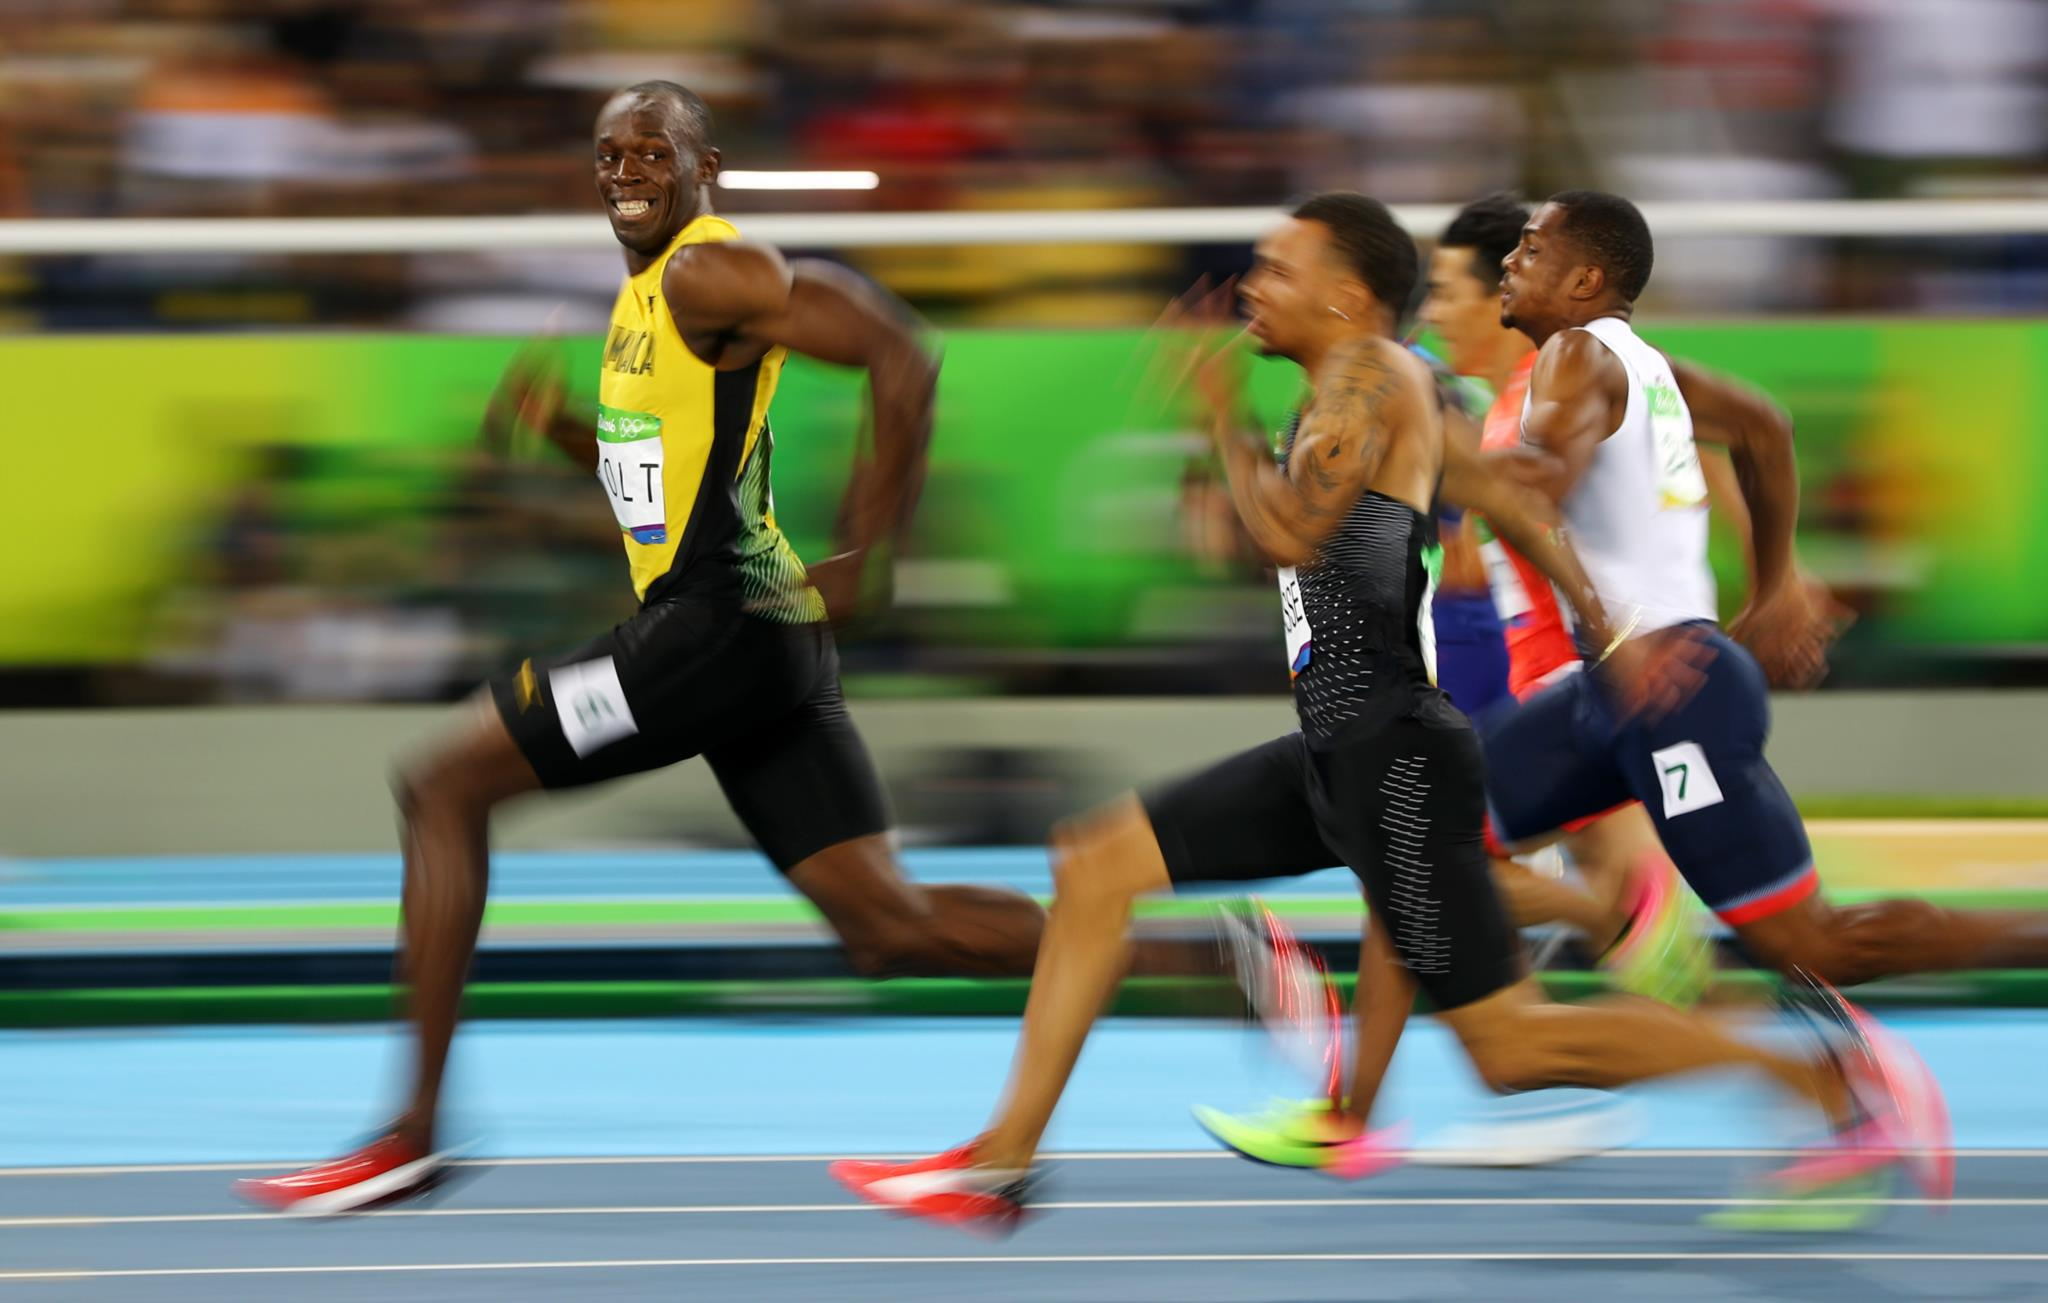 Meia-final dos 100m nos Jogos Olímpicos do Rio de Janeiro: Bolt sorri vitorioso antes de cortar a meta.